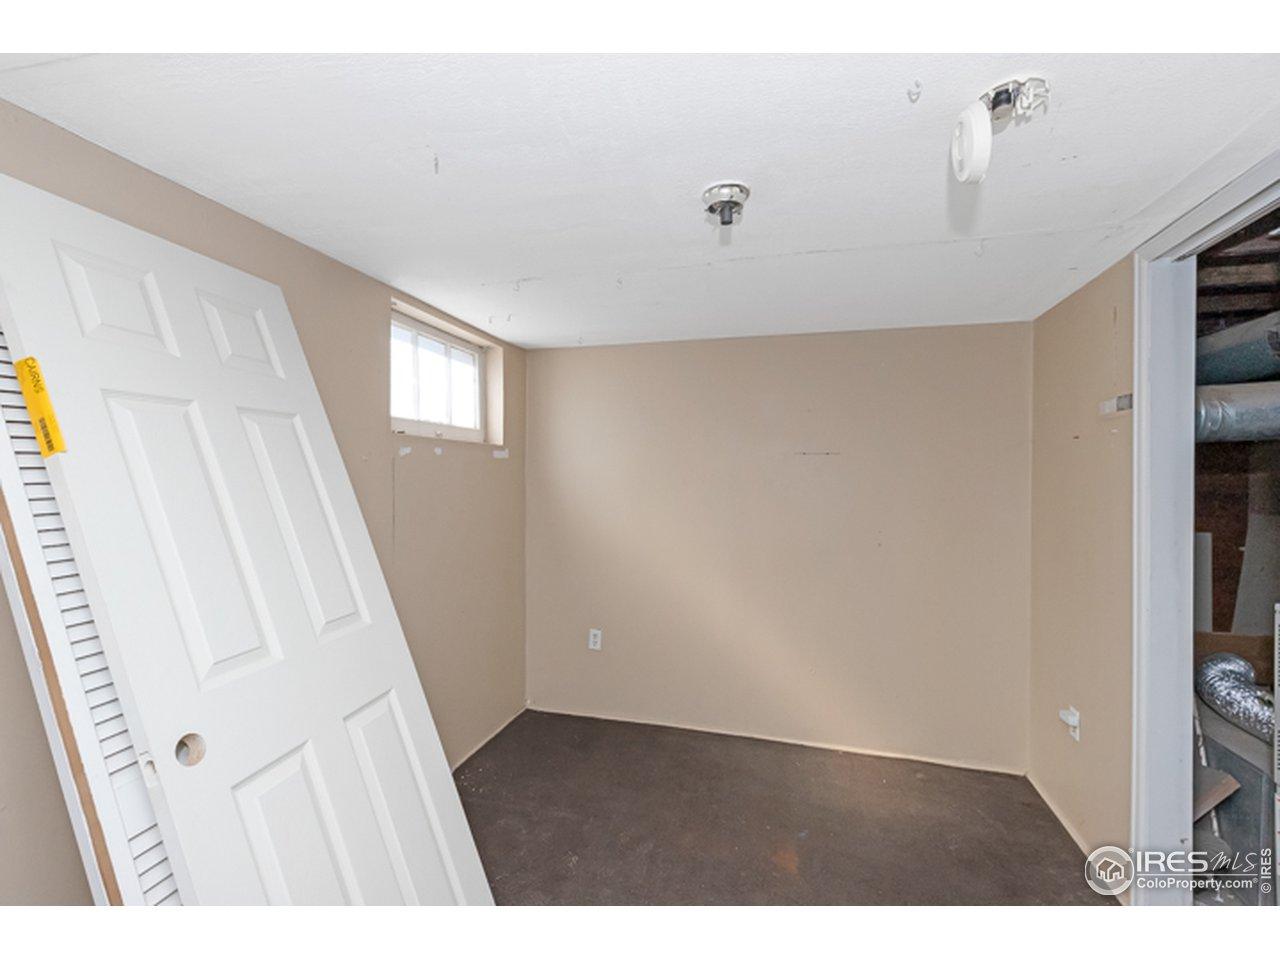 Basement flex room space